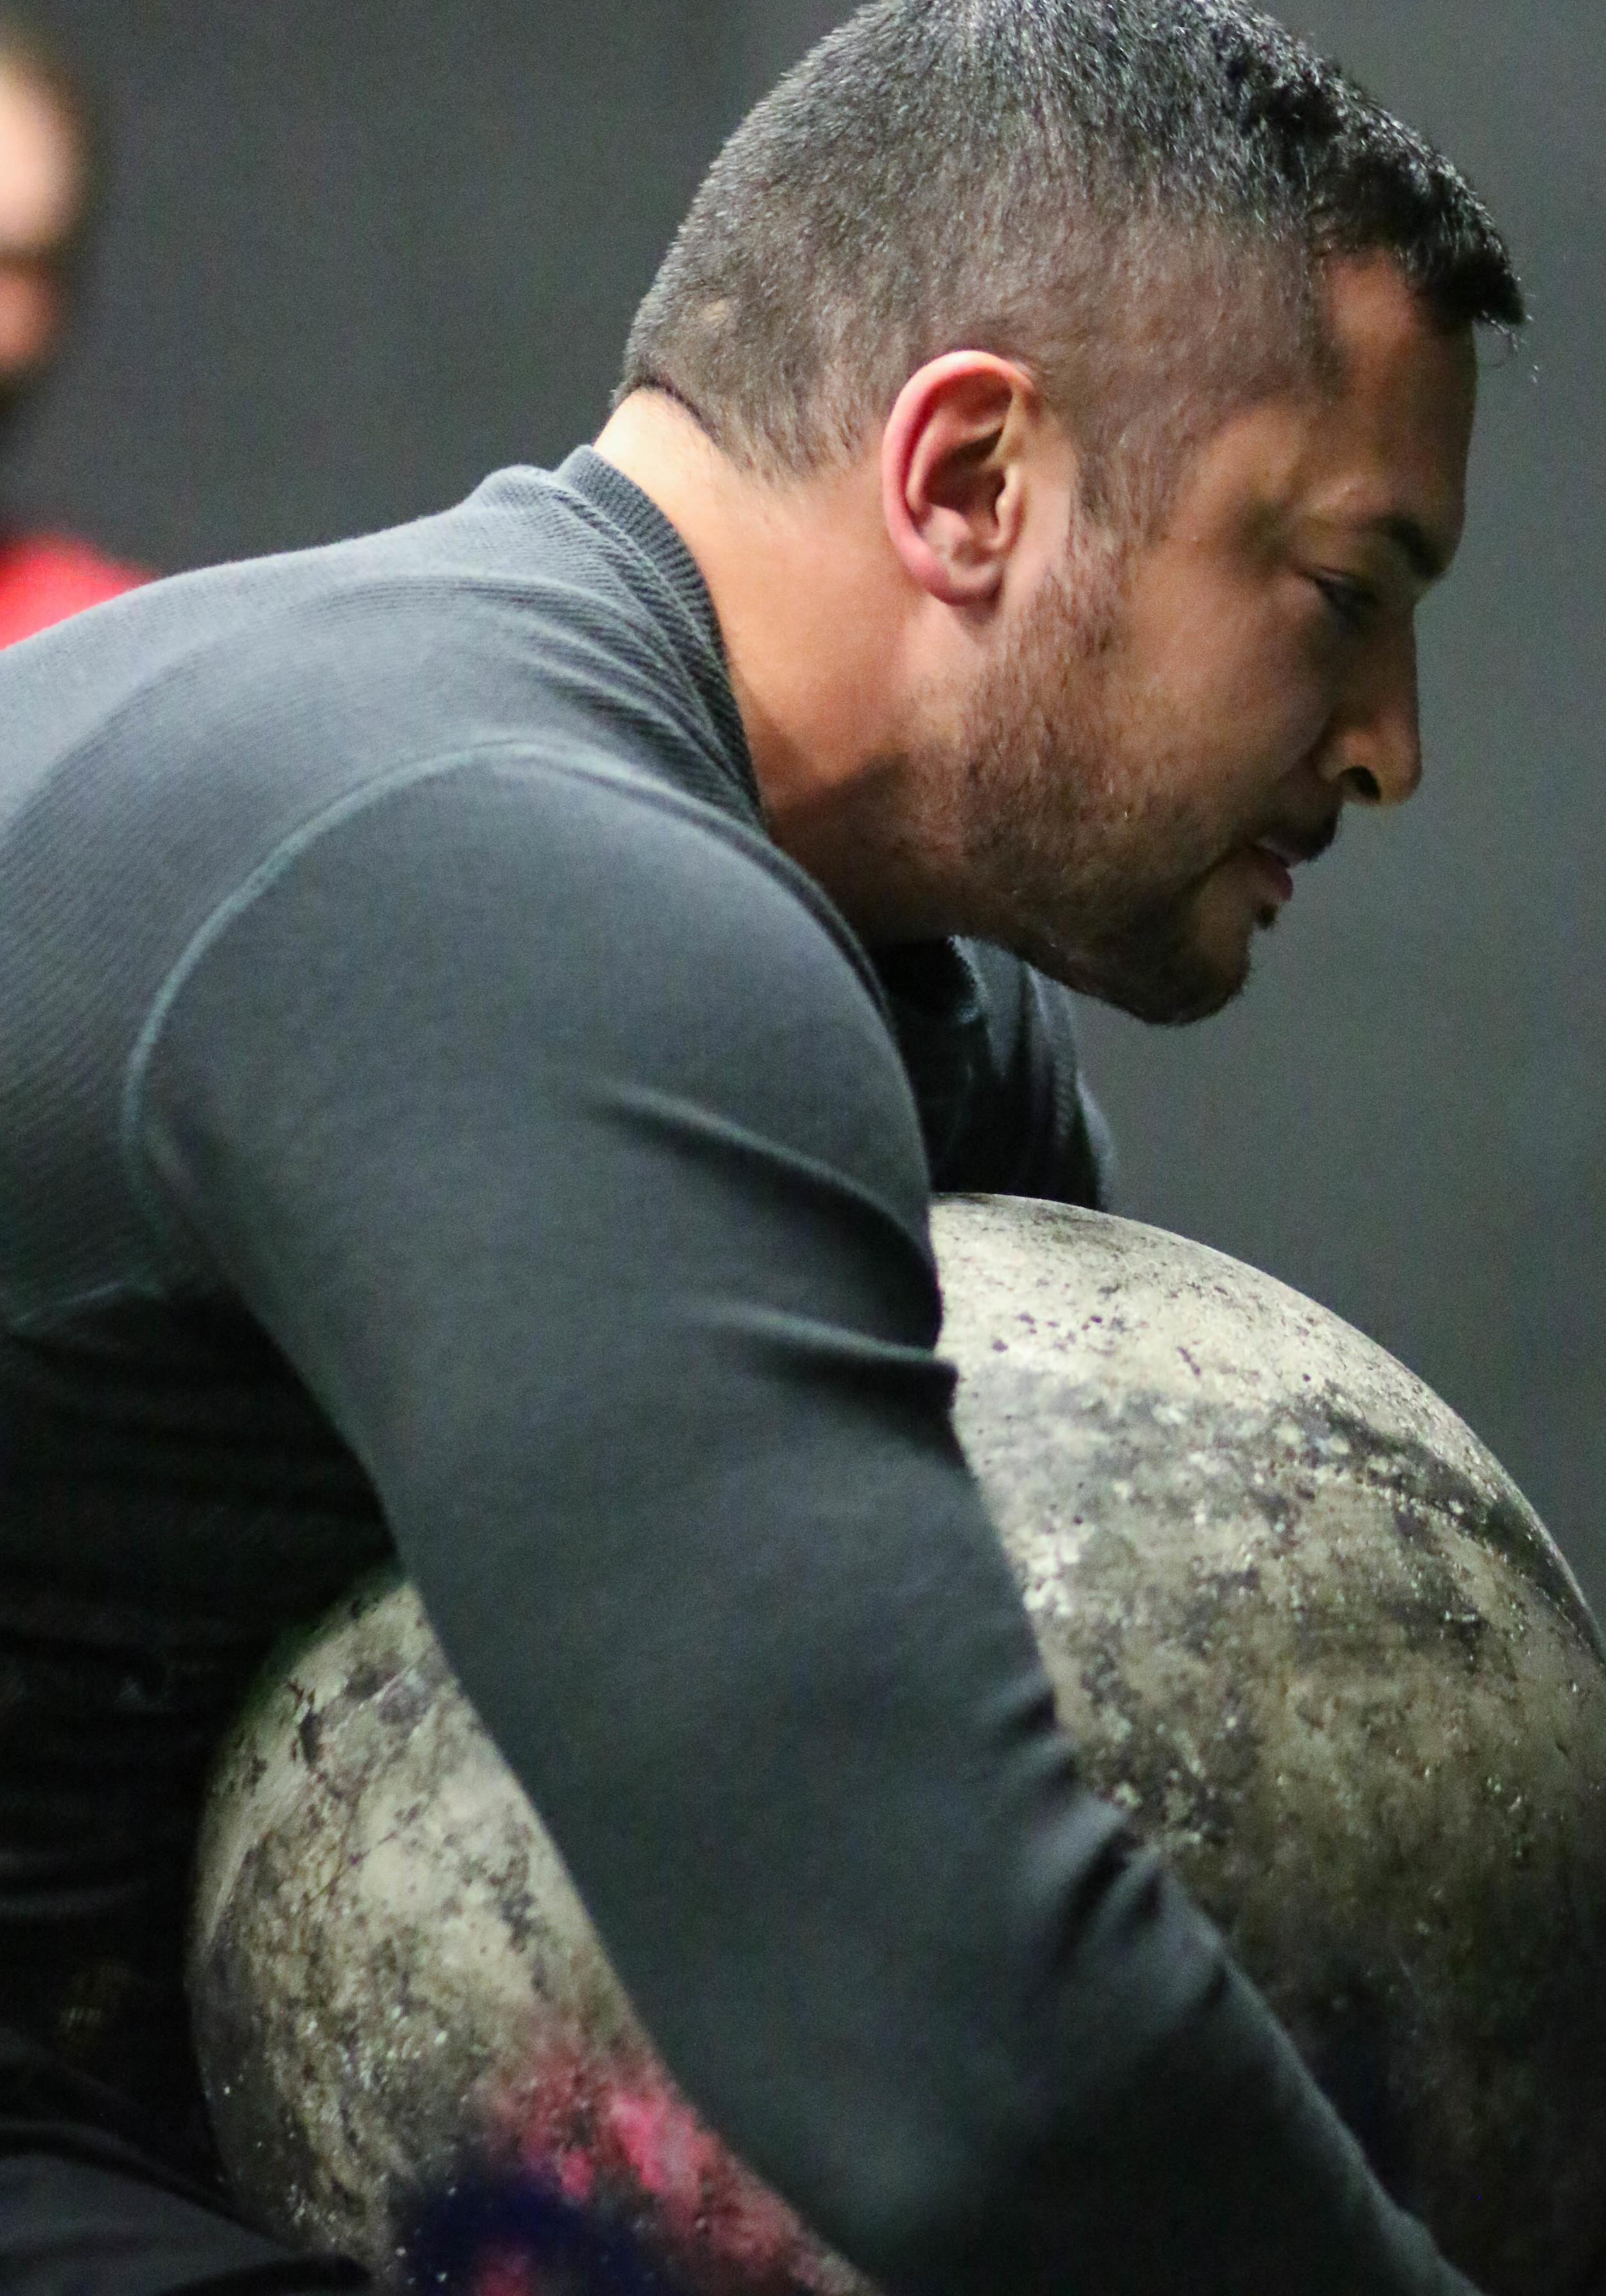 harrison strength_strong man_atlas stones-56.jpg